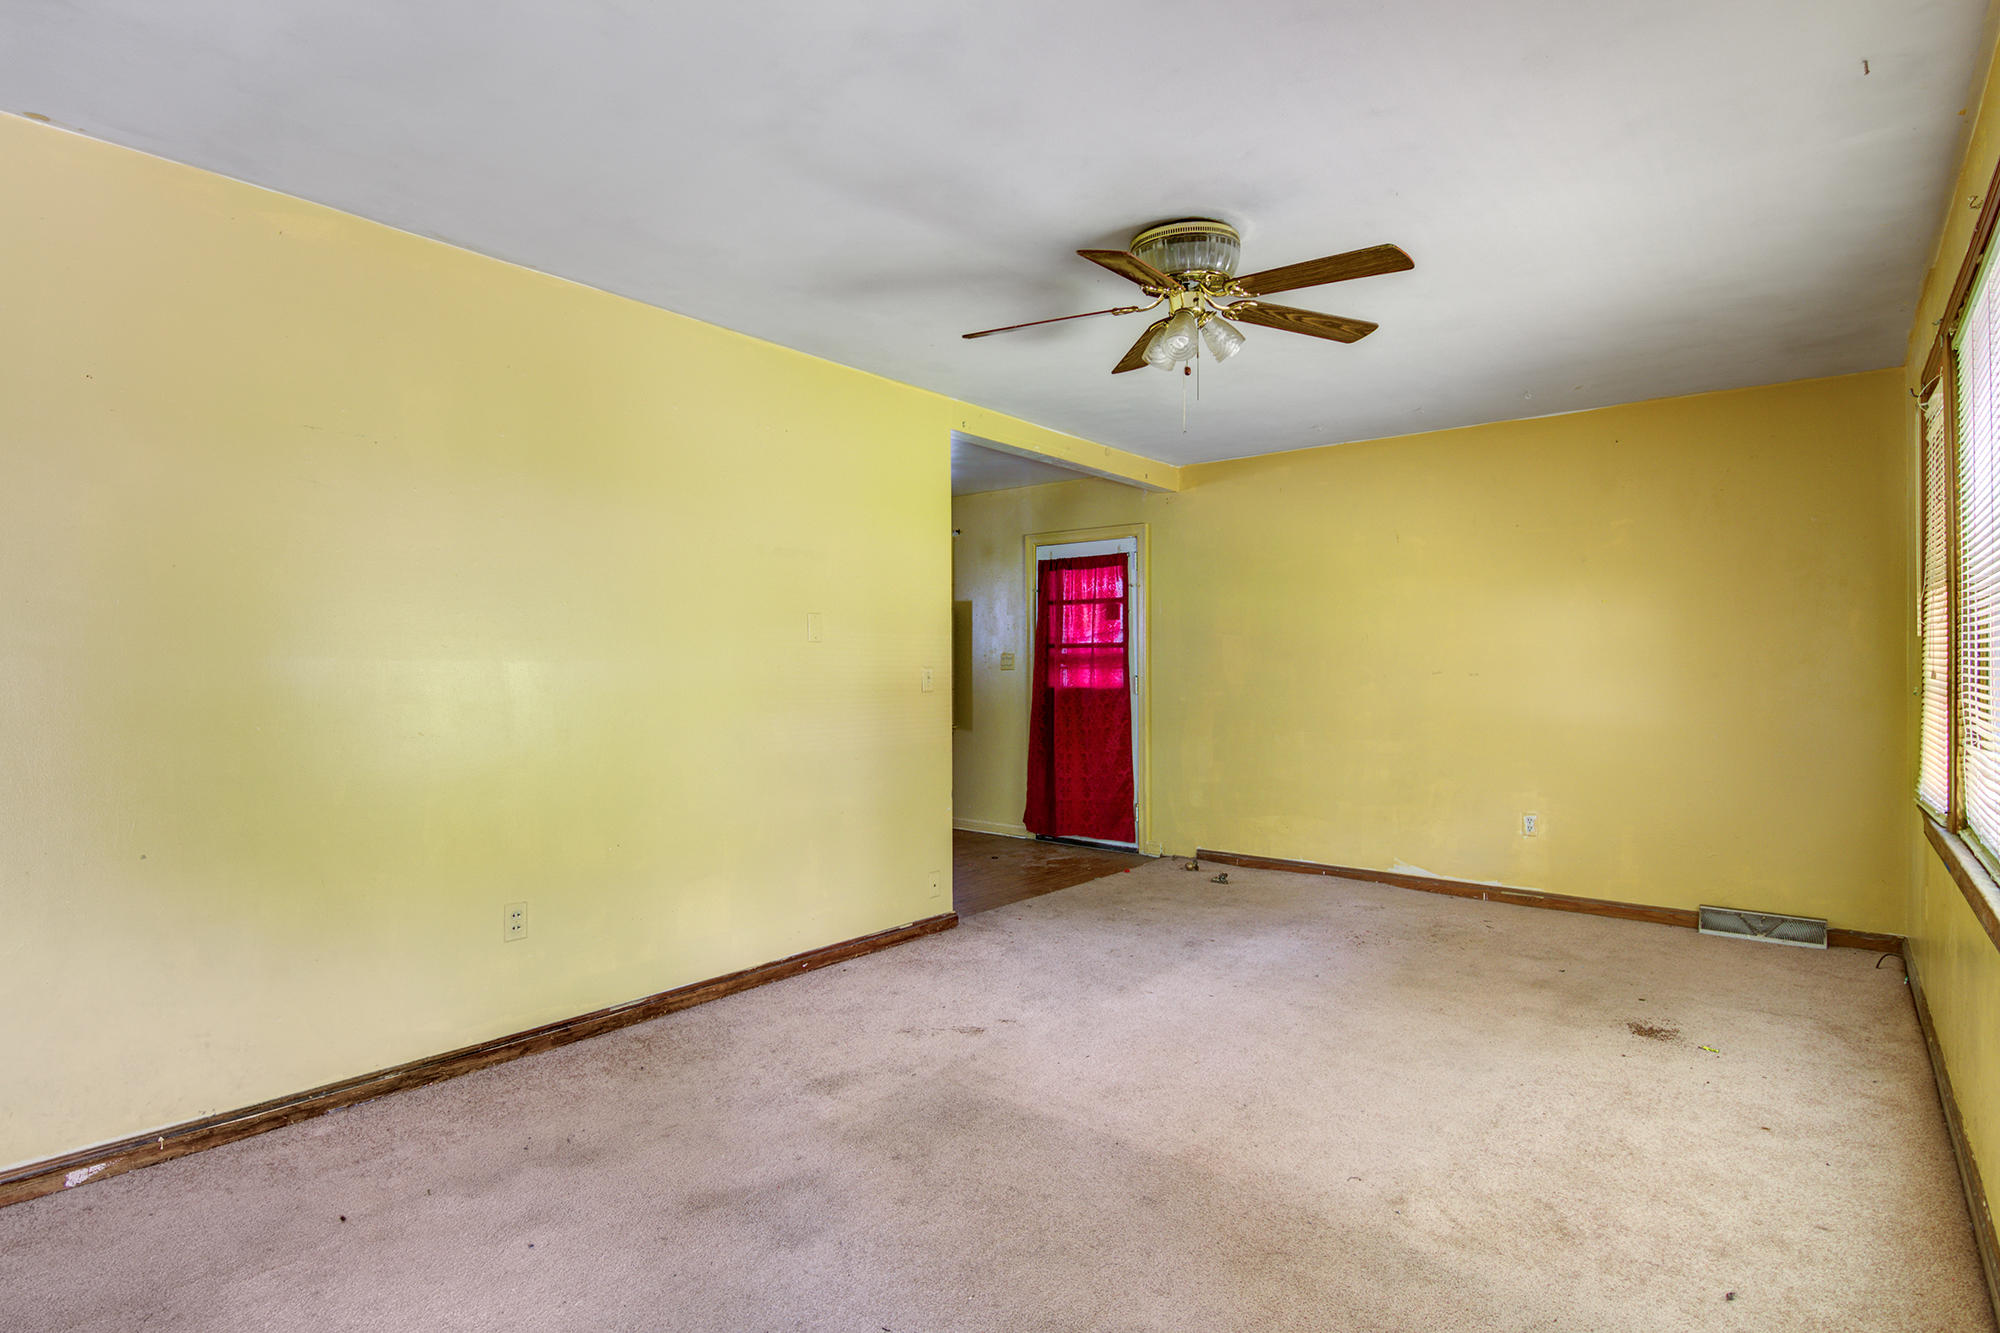 Photo of 2603 Stith Ave, North Charleston, SC 29405